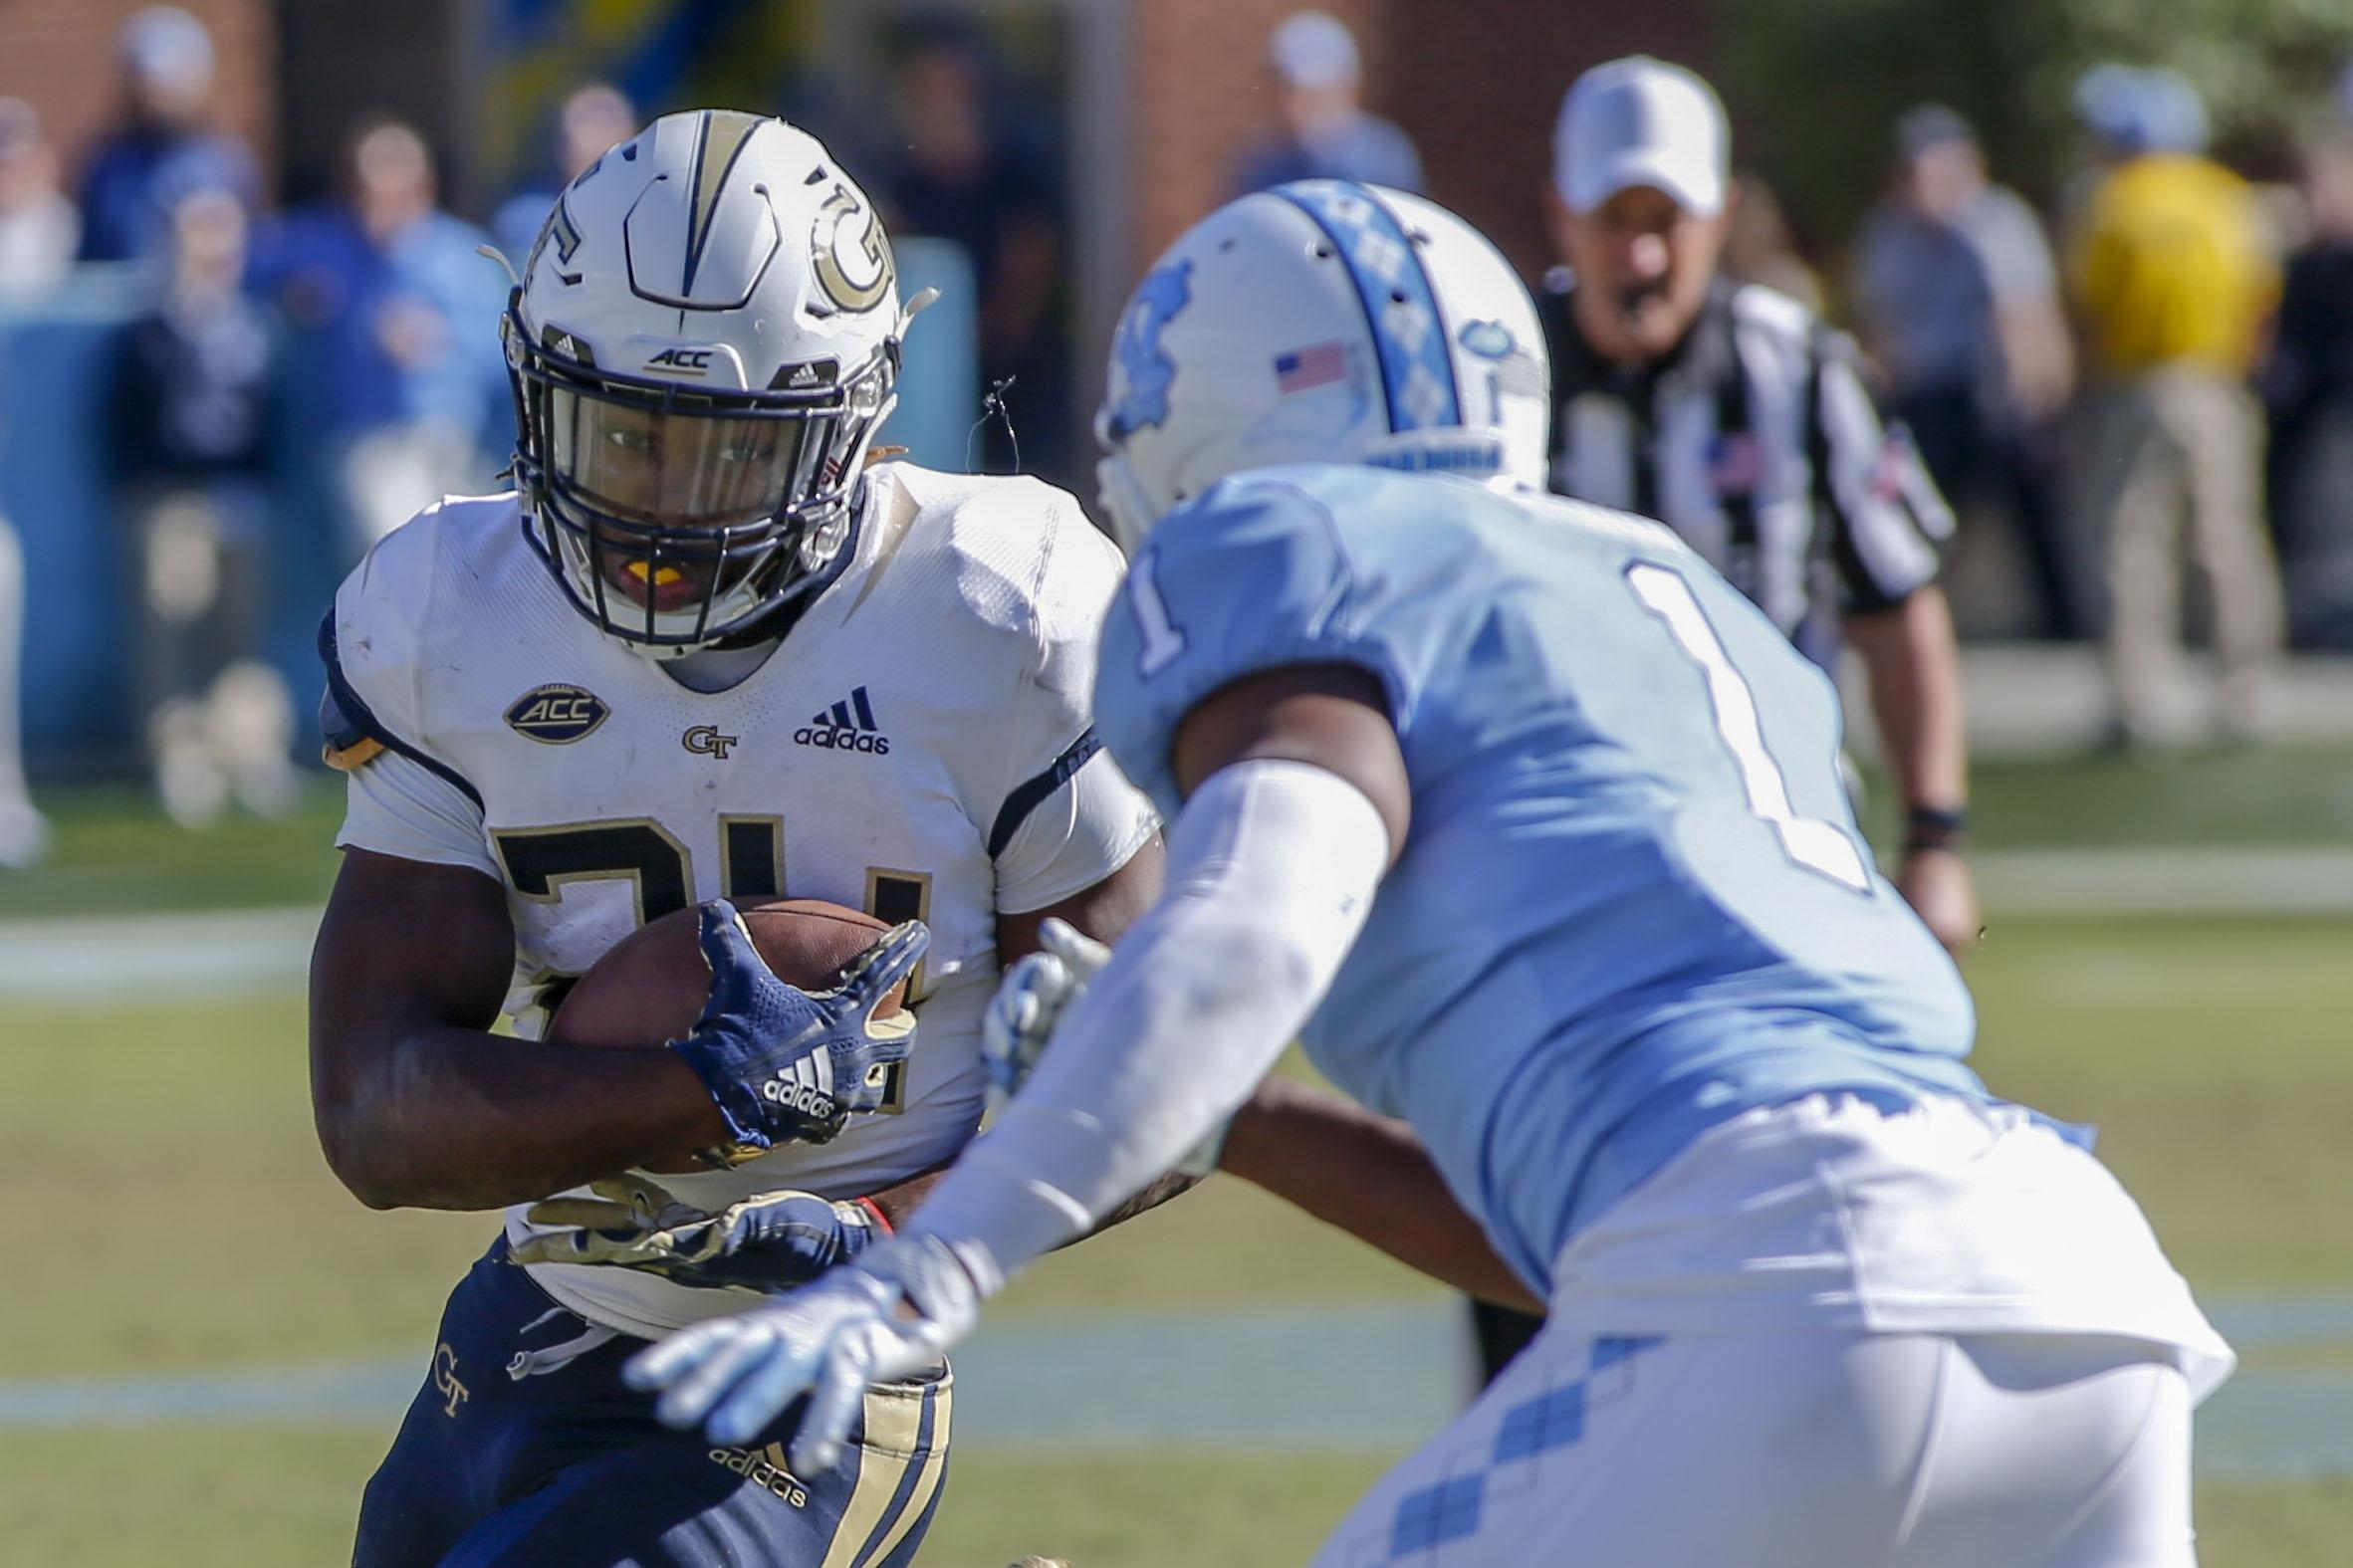 NCAA Football: Georgia Tech at North Carolina